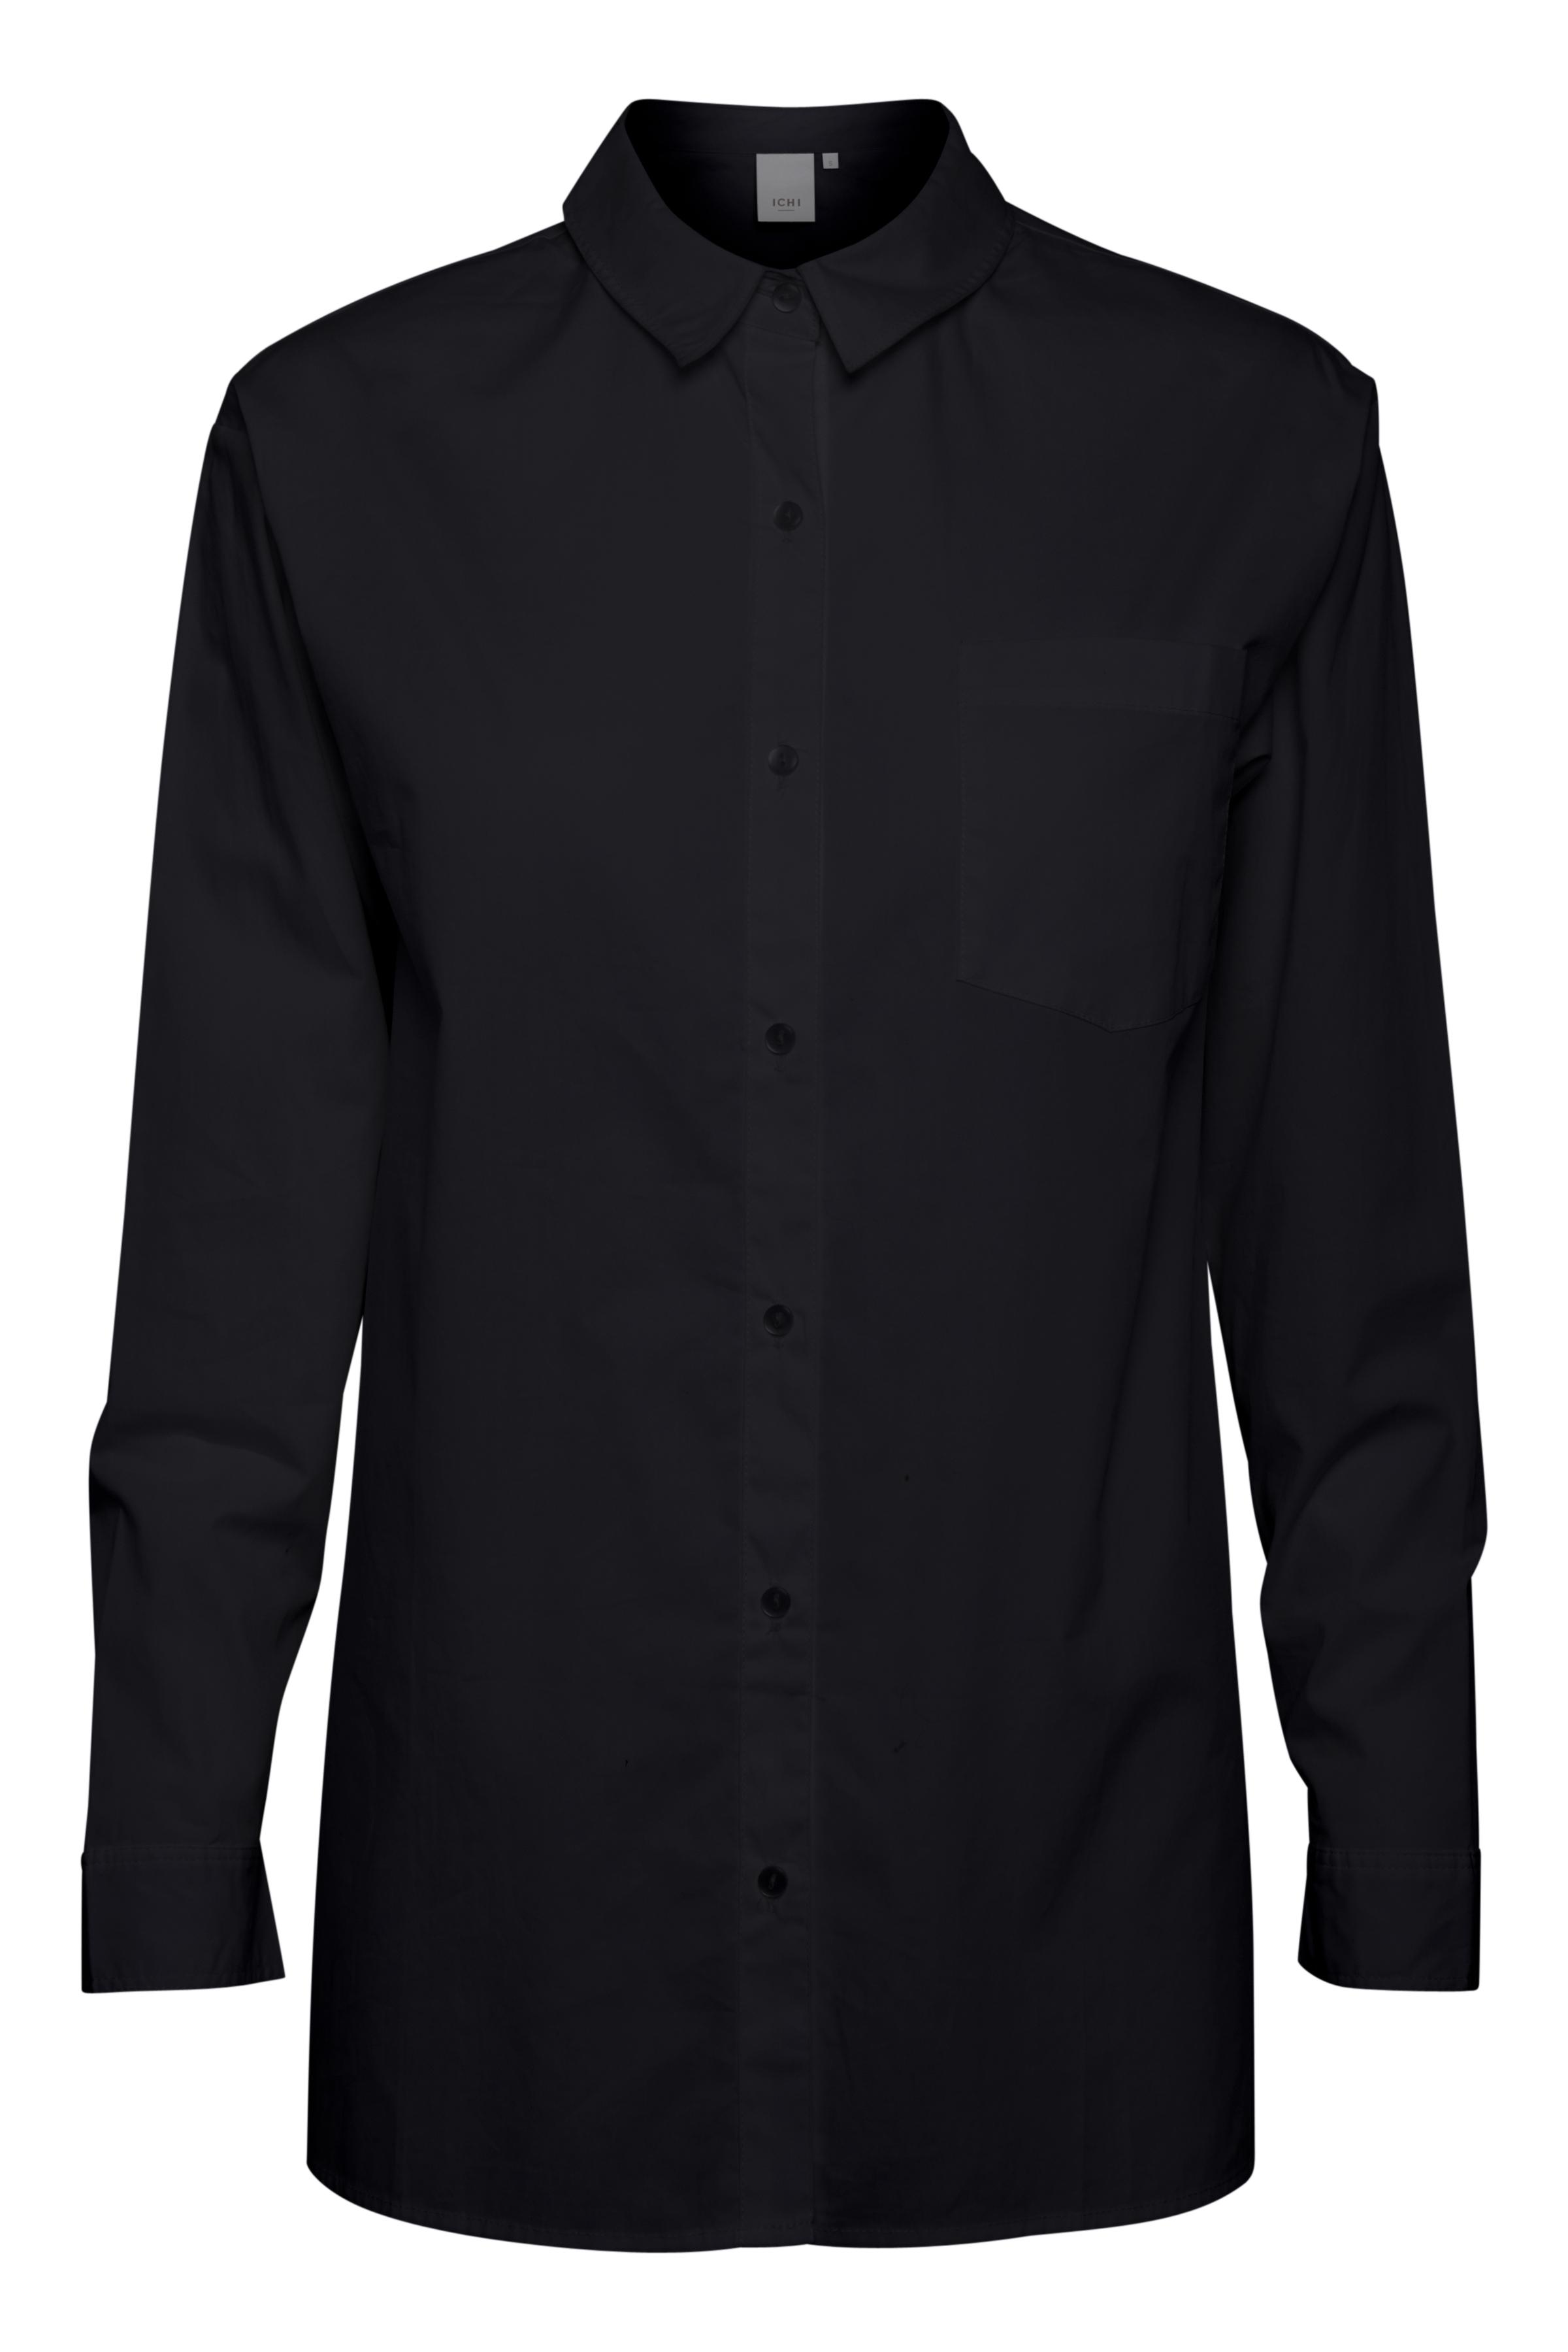 Black Langærmet skjorte – Køb Black Langærmet skjorte fra str. XS-XXL her